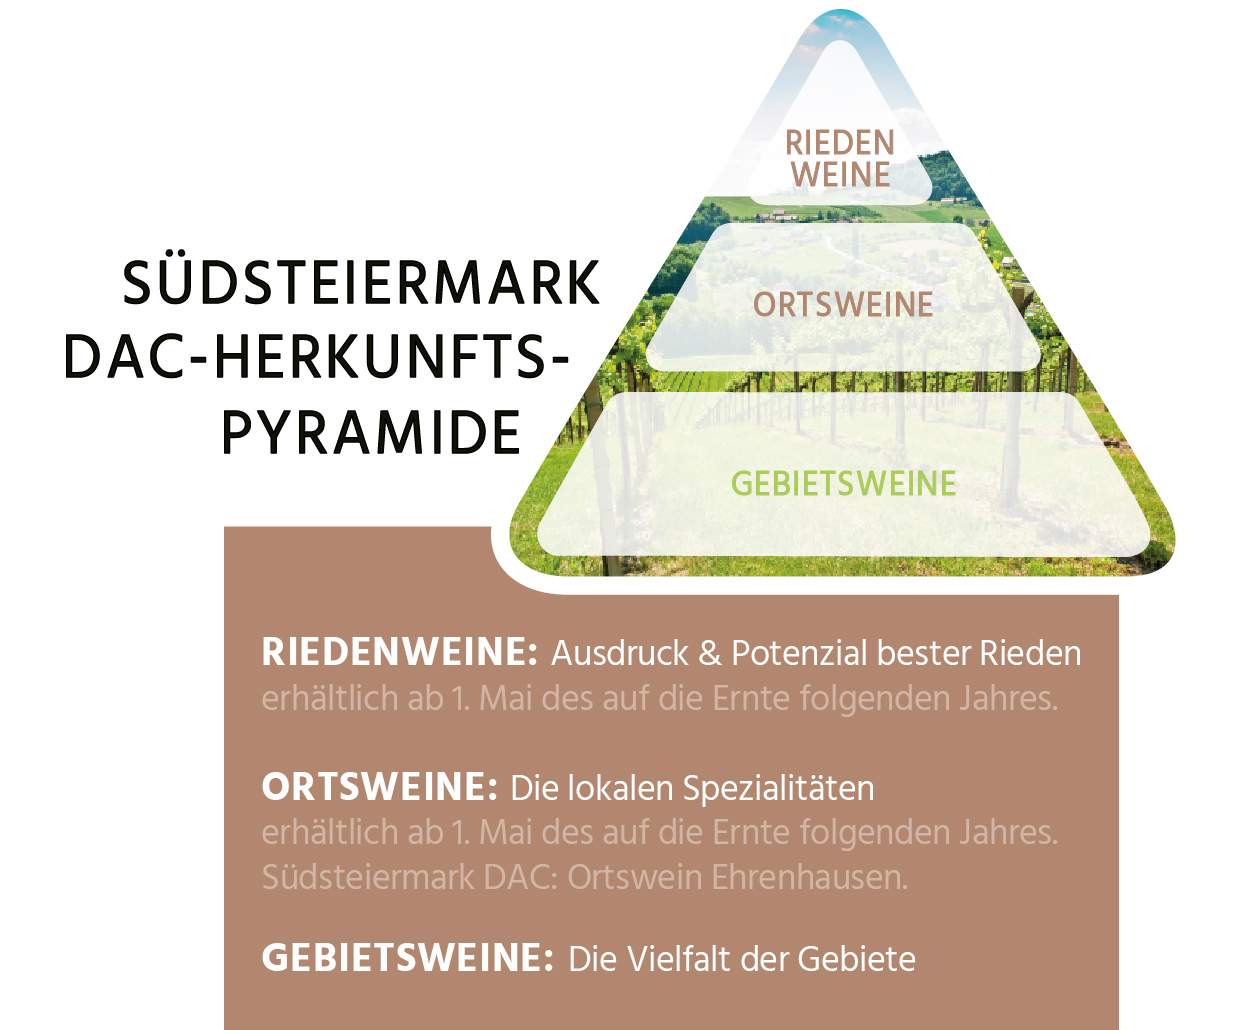 südsteiermark dac herkunftspyramide